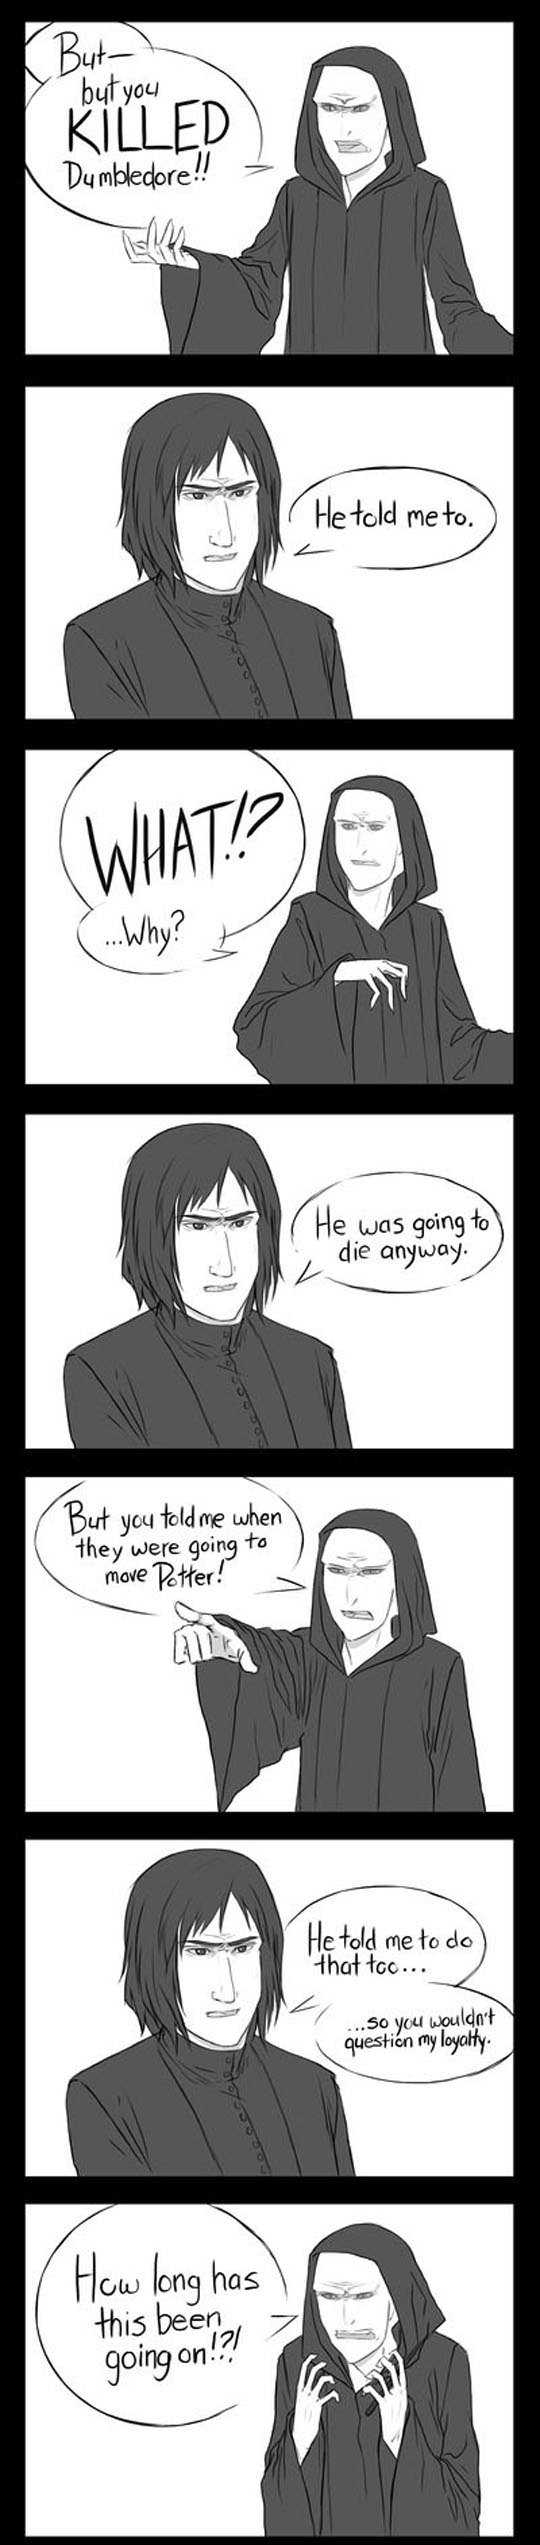 funny-Harry-Potter-comic-Snape-Voldemort-Dumbledore